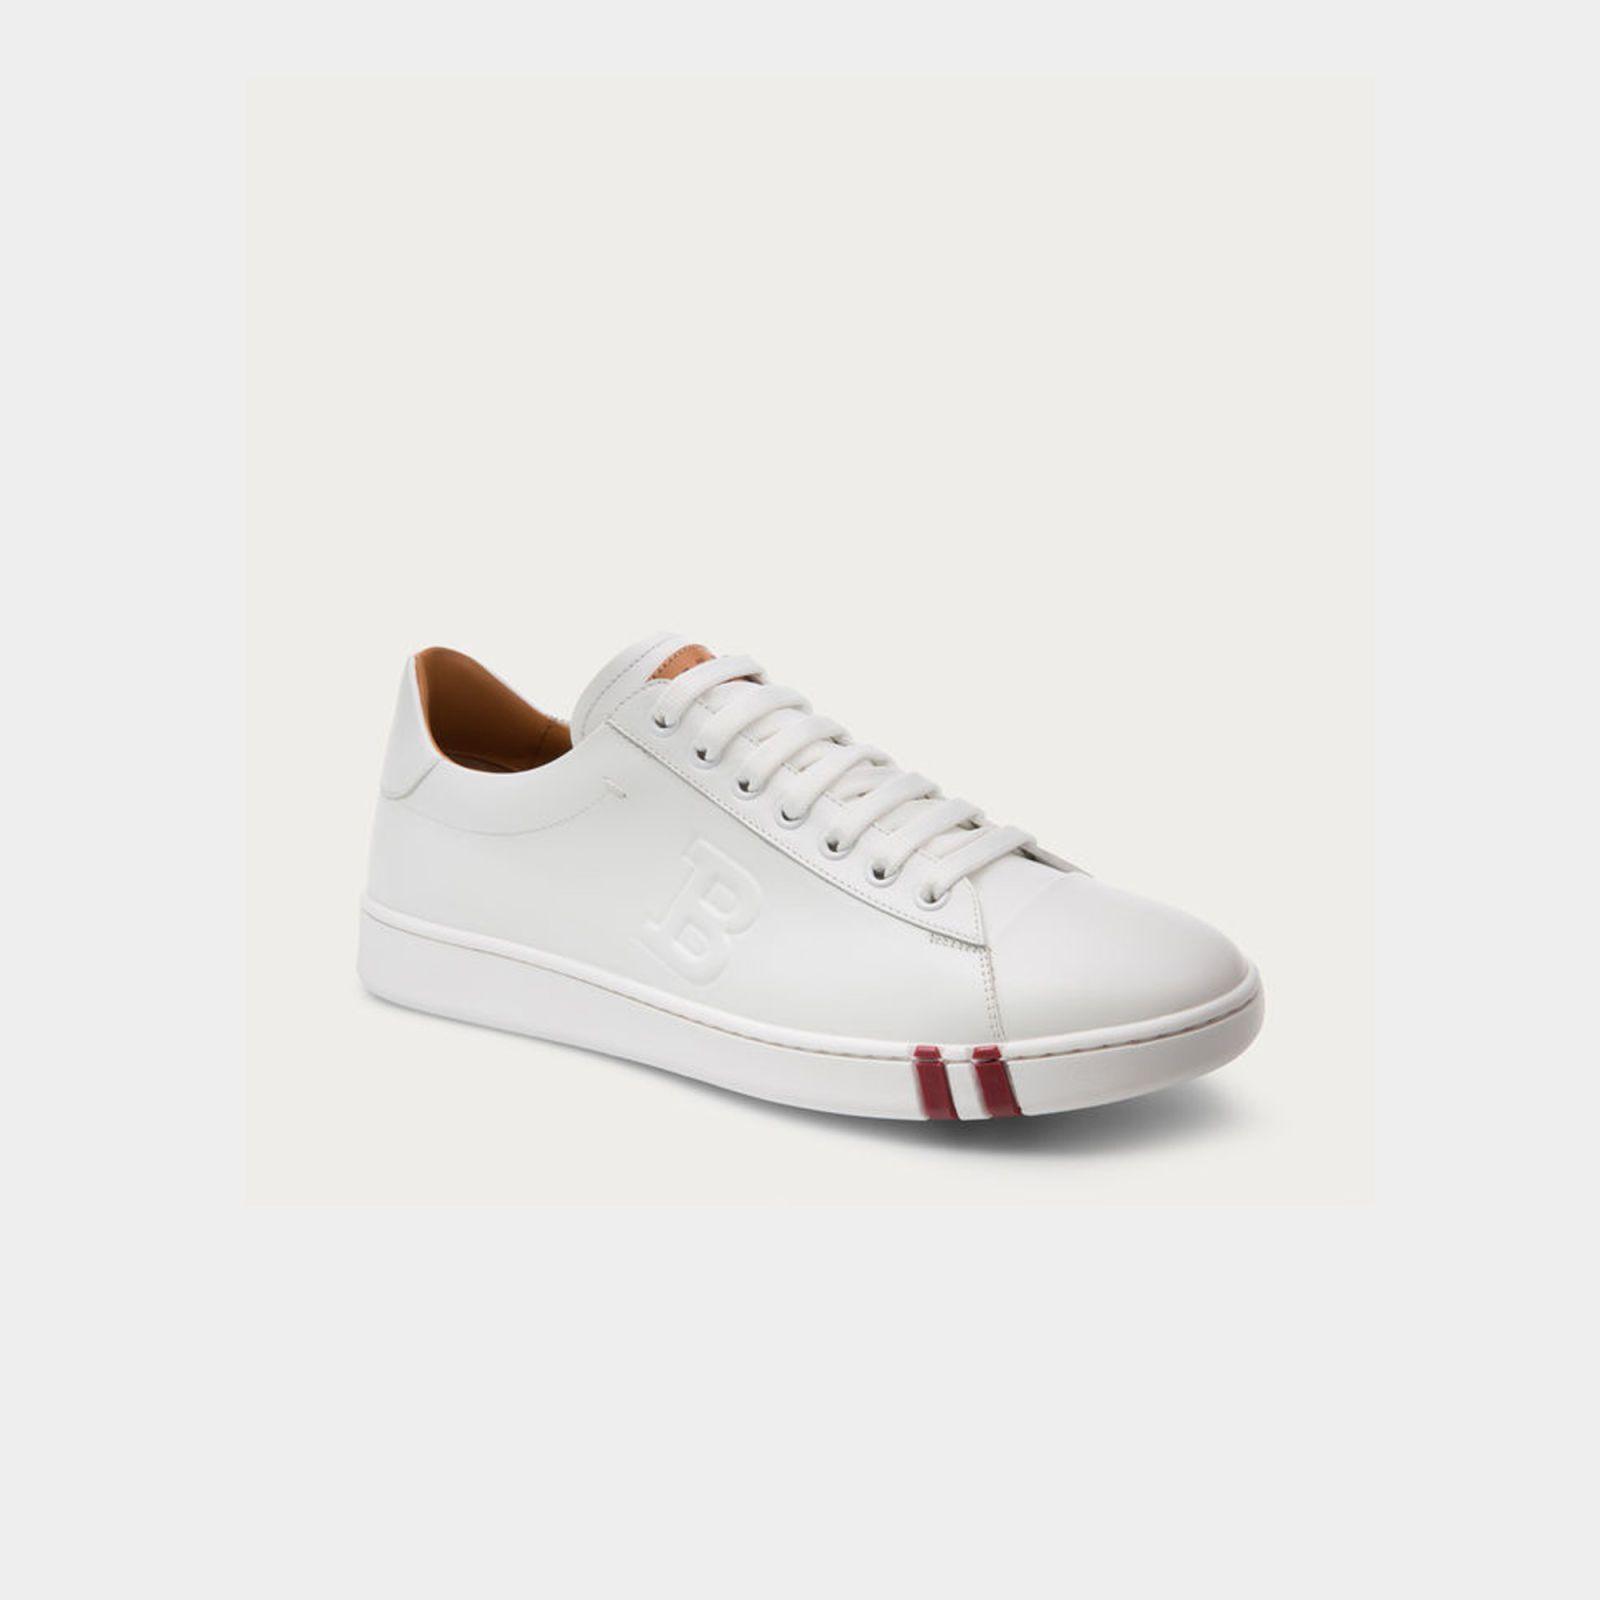 "<p><em>€ 375, </em><a href=""http://www.bally.eu/en/shop-man/shoes/trainers/asher-men%E2%80%99s-leather-low-top-trainer-in-white-6205250.html#start=1"" target=""_blank""><em>bally.com</em></a></p>"